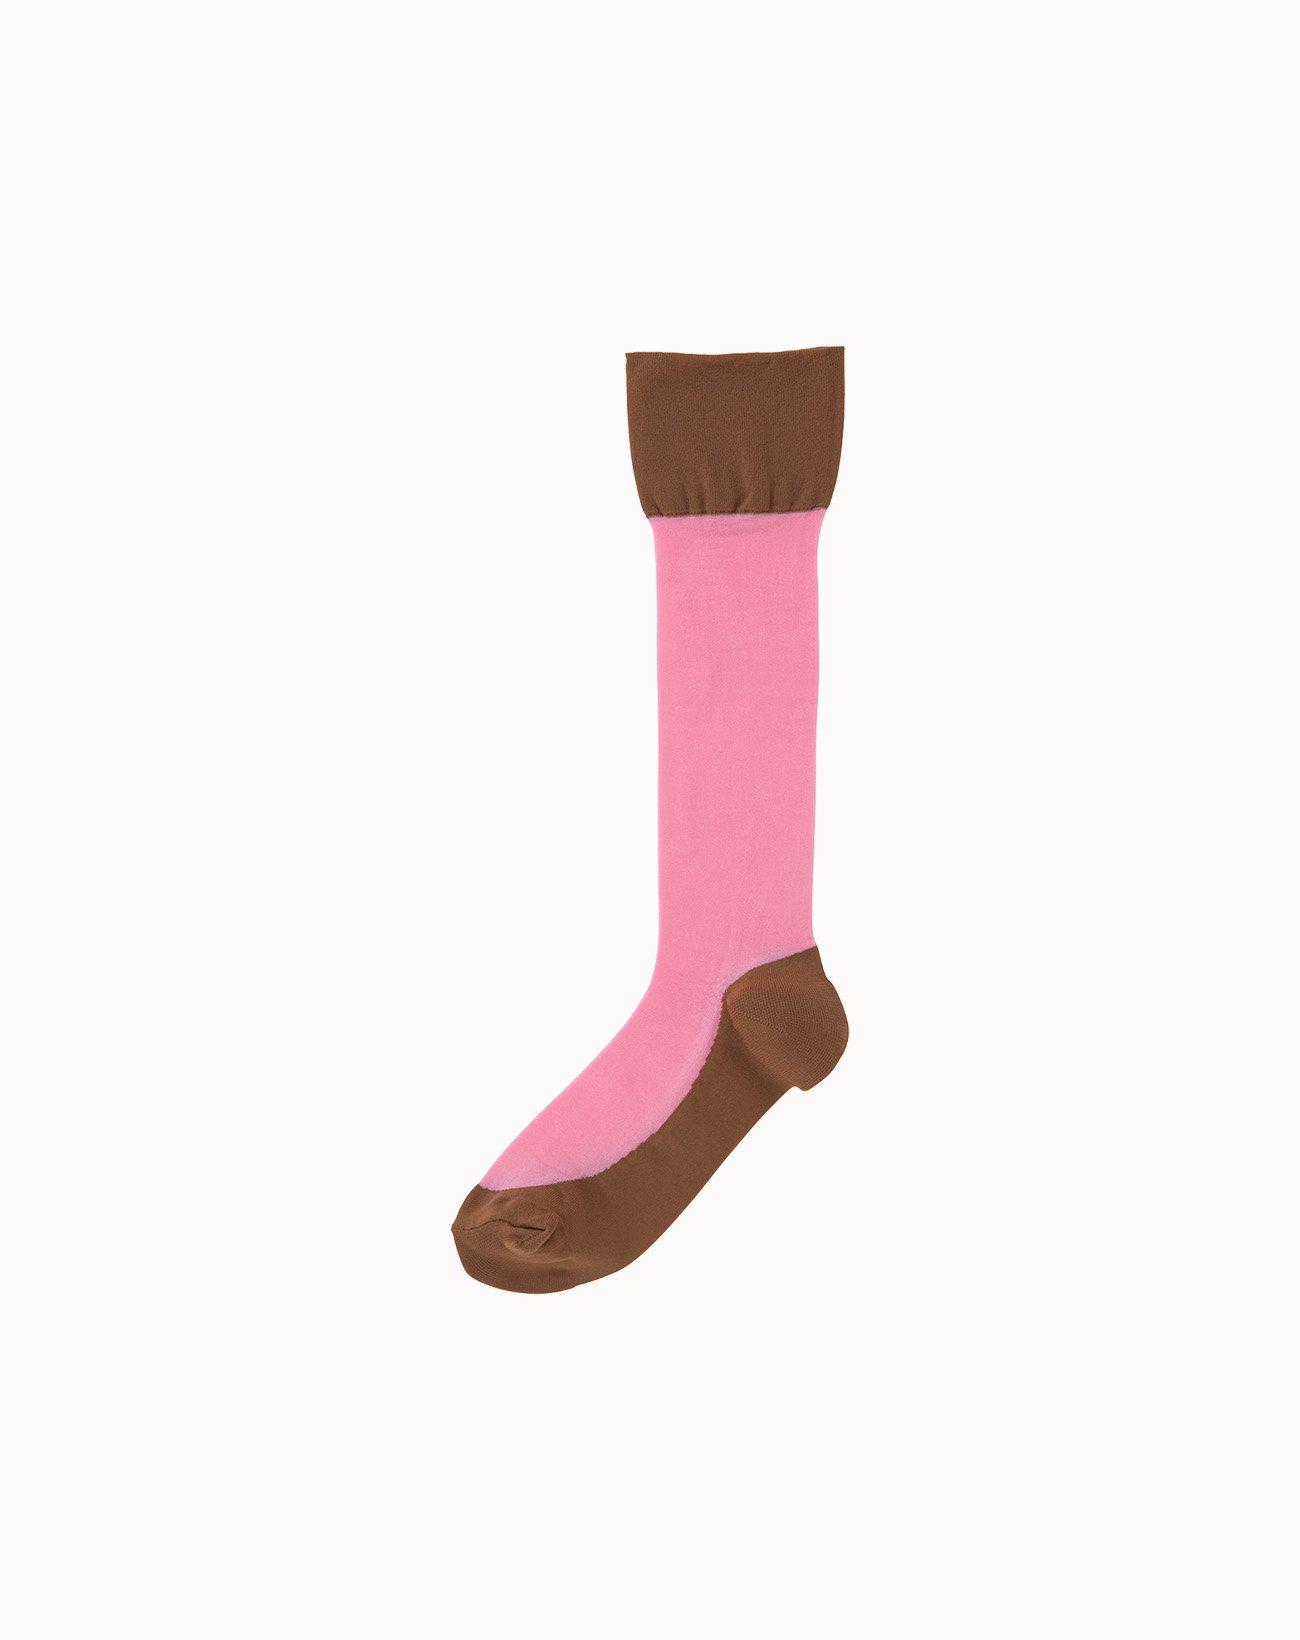 leur logette - Sheer Pattern Socks-Light Pink